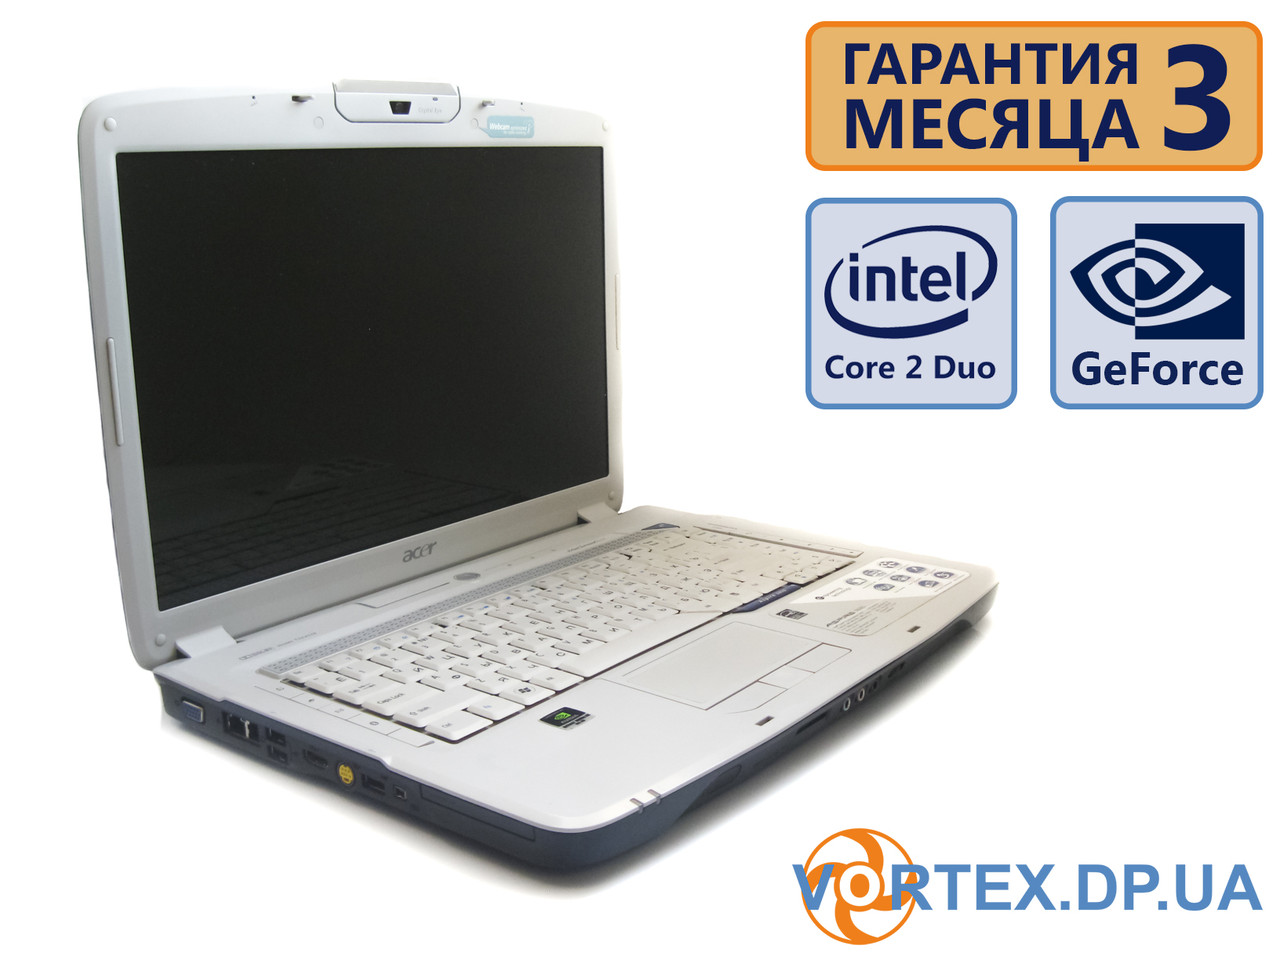 Ноутбук Acer Aspire 5920 15.4 (1280x800) / Intel Core 2 Duo T5450 (2x1